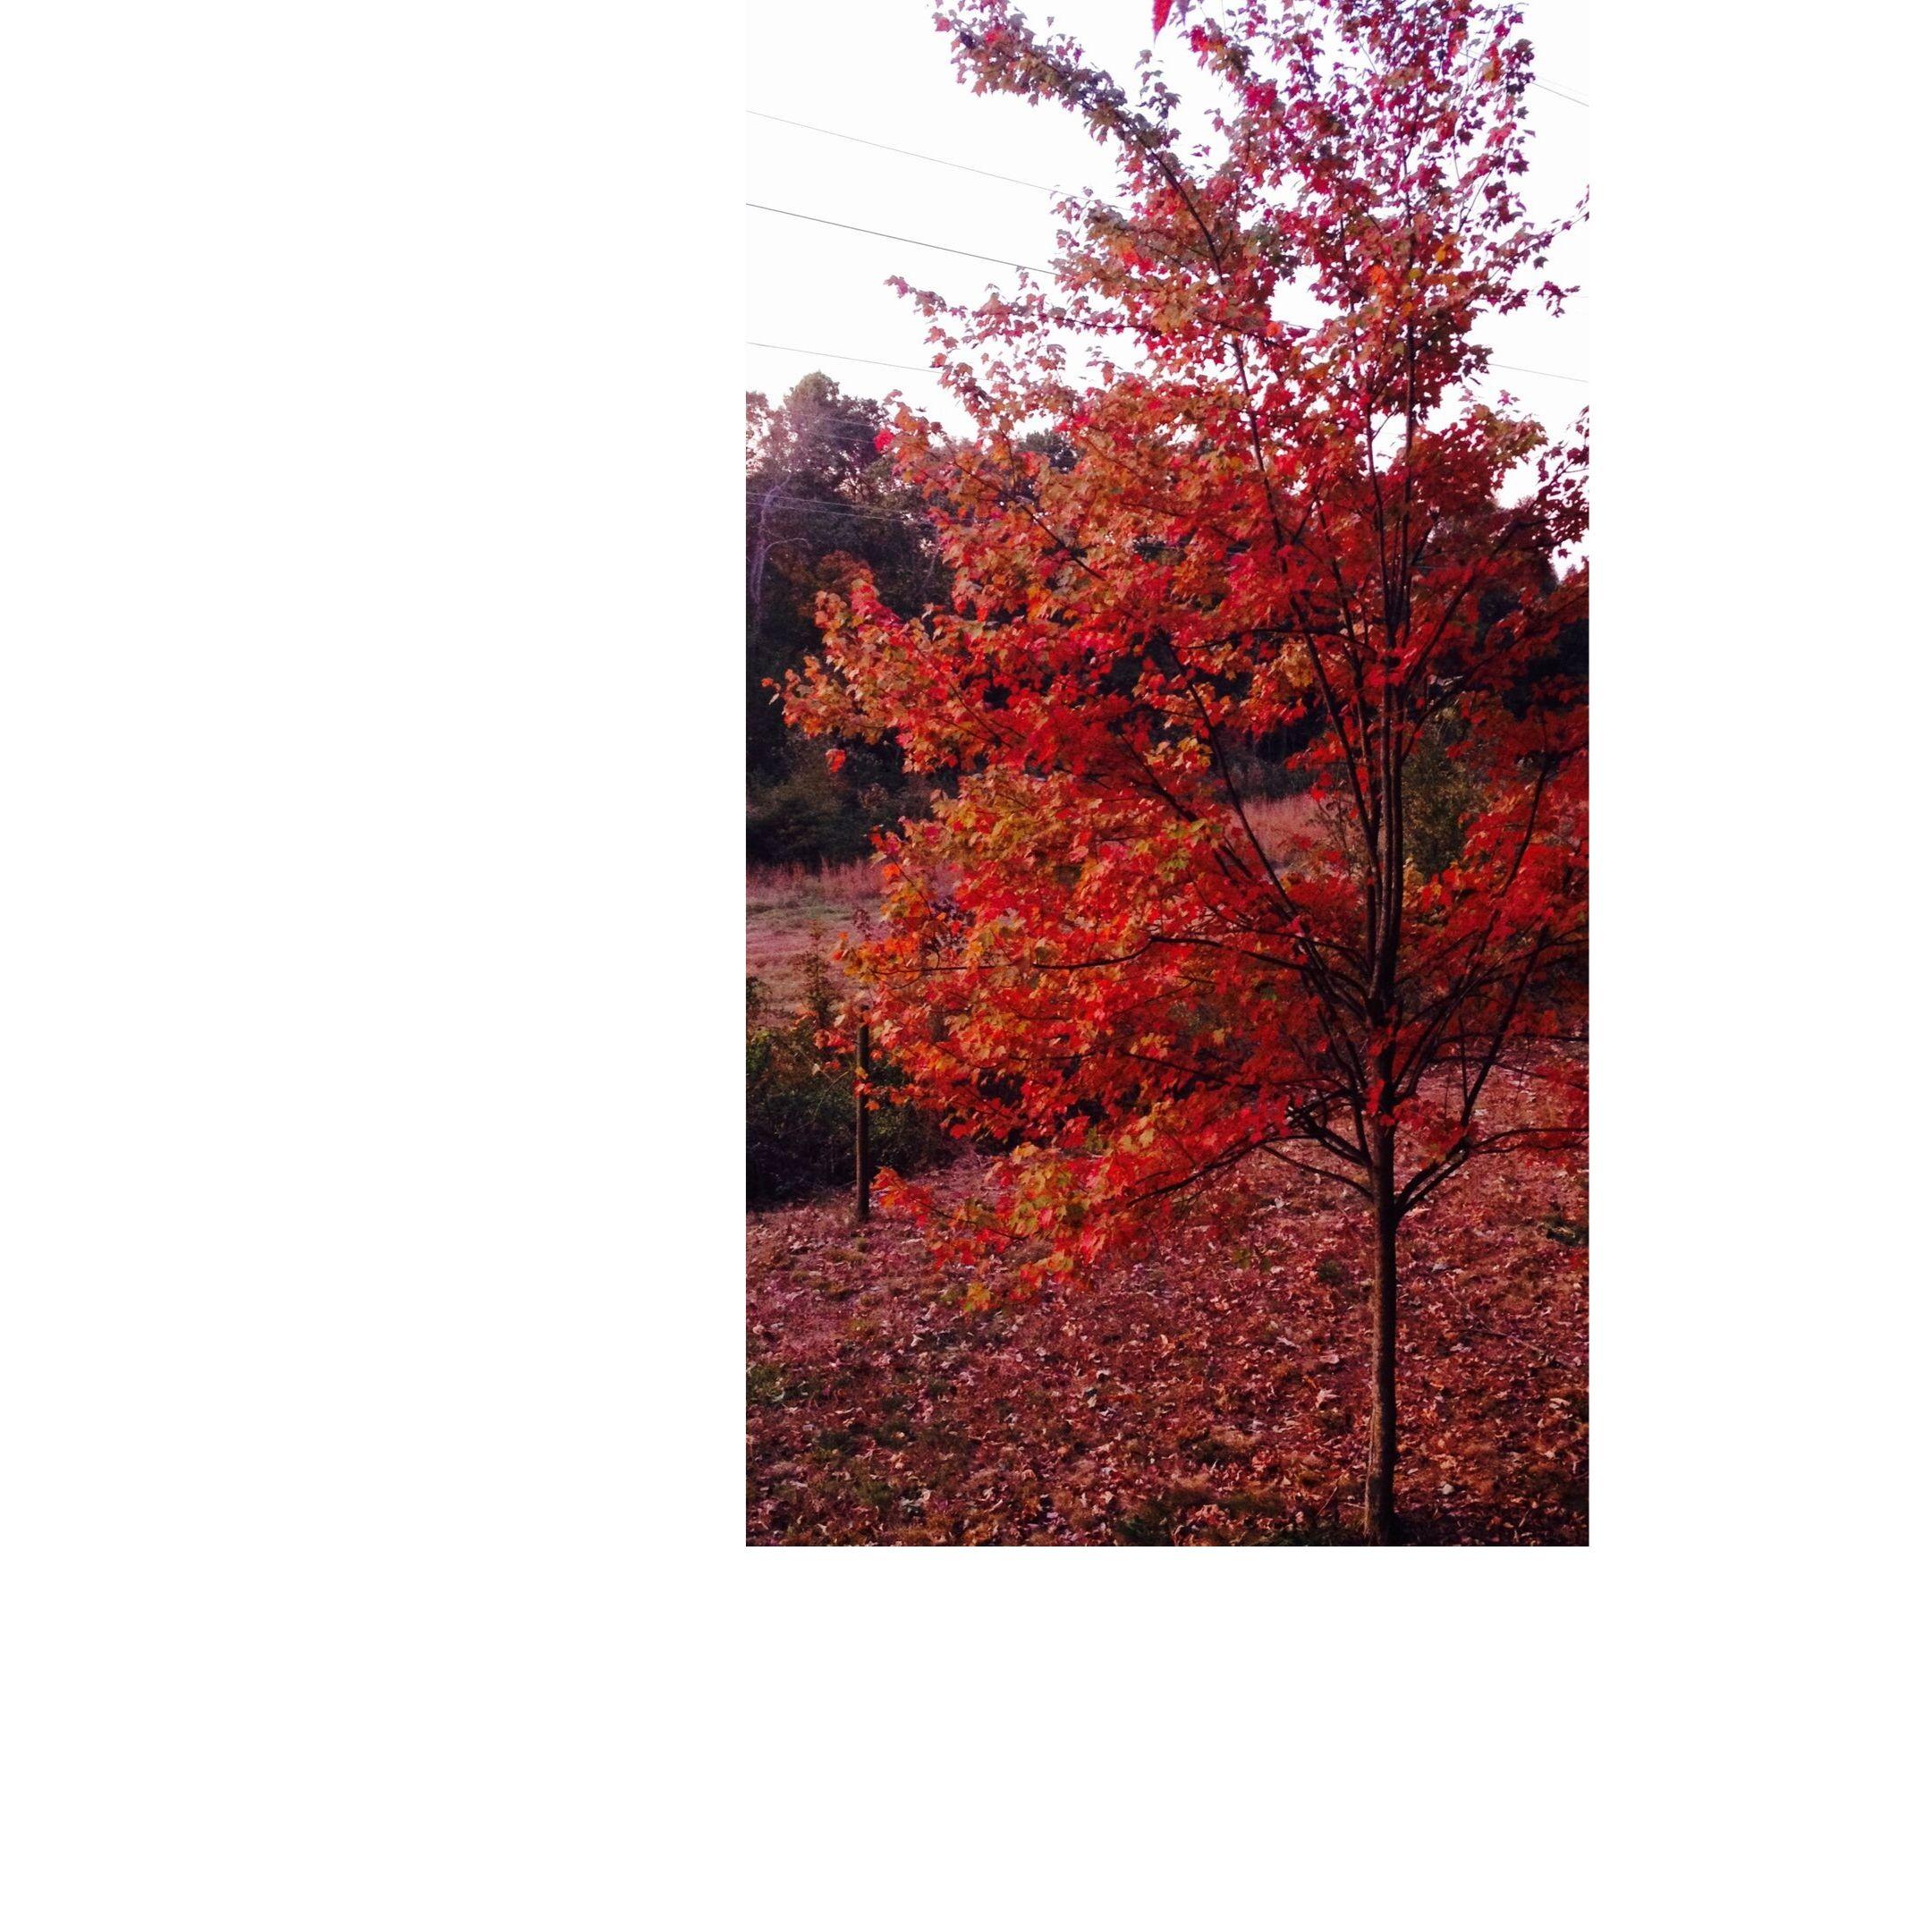 tree in full fall vestment